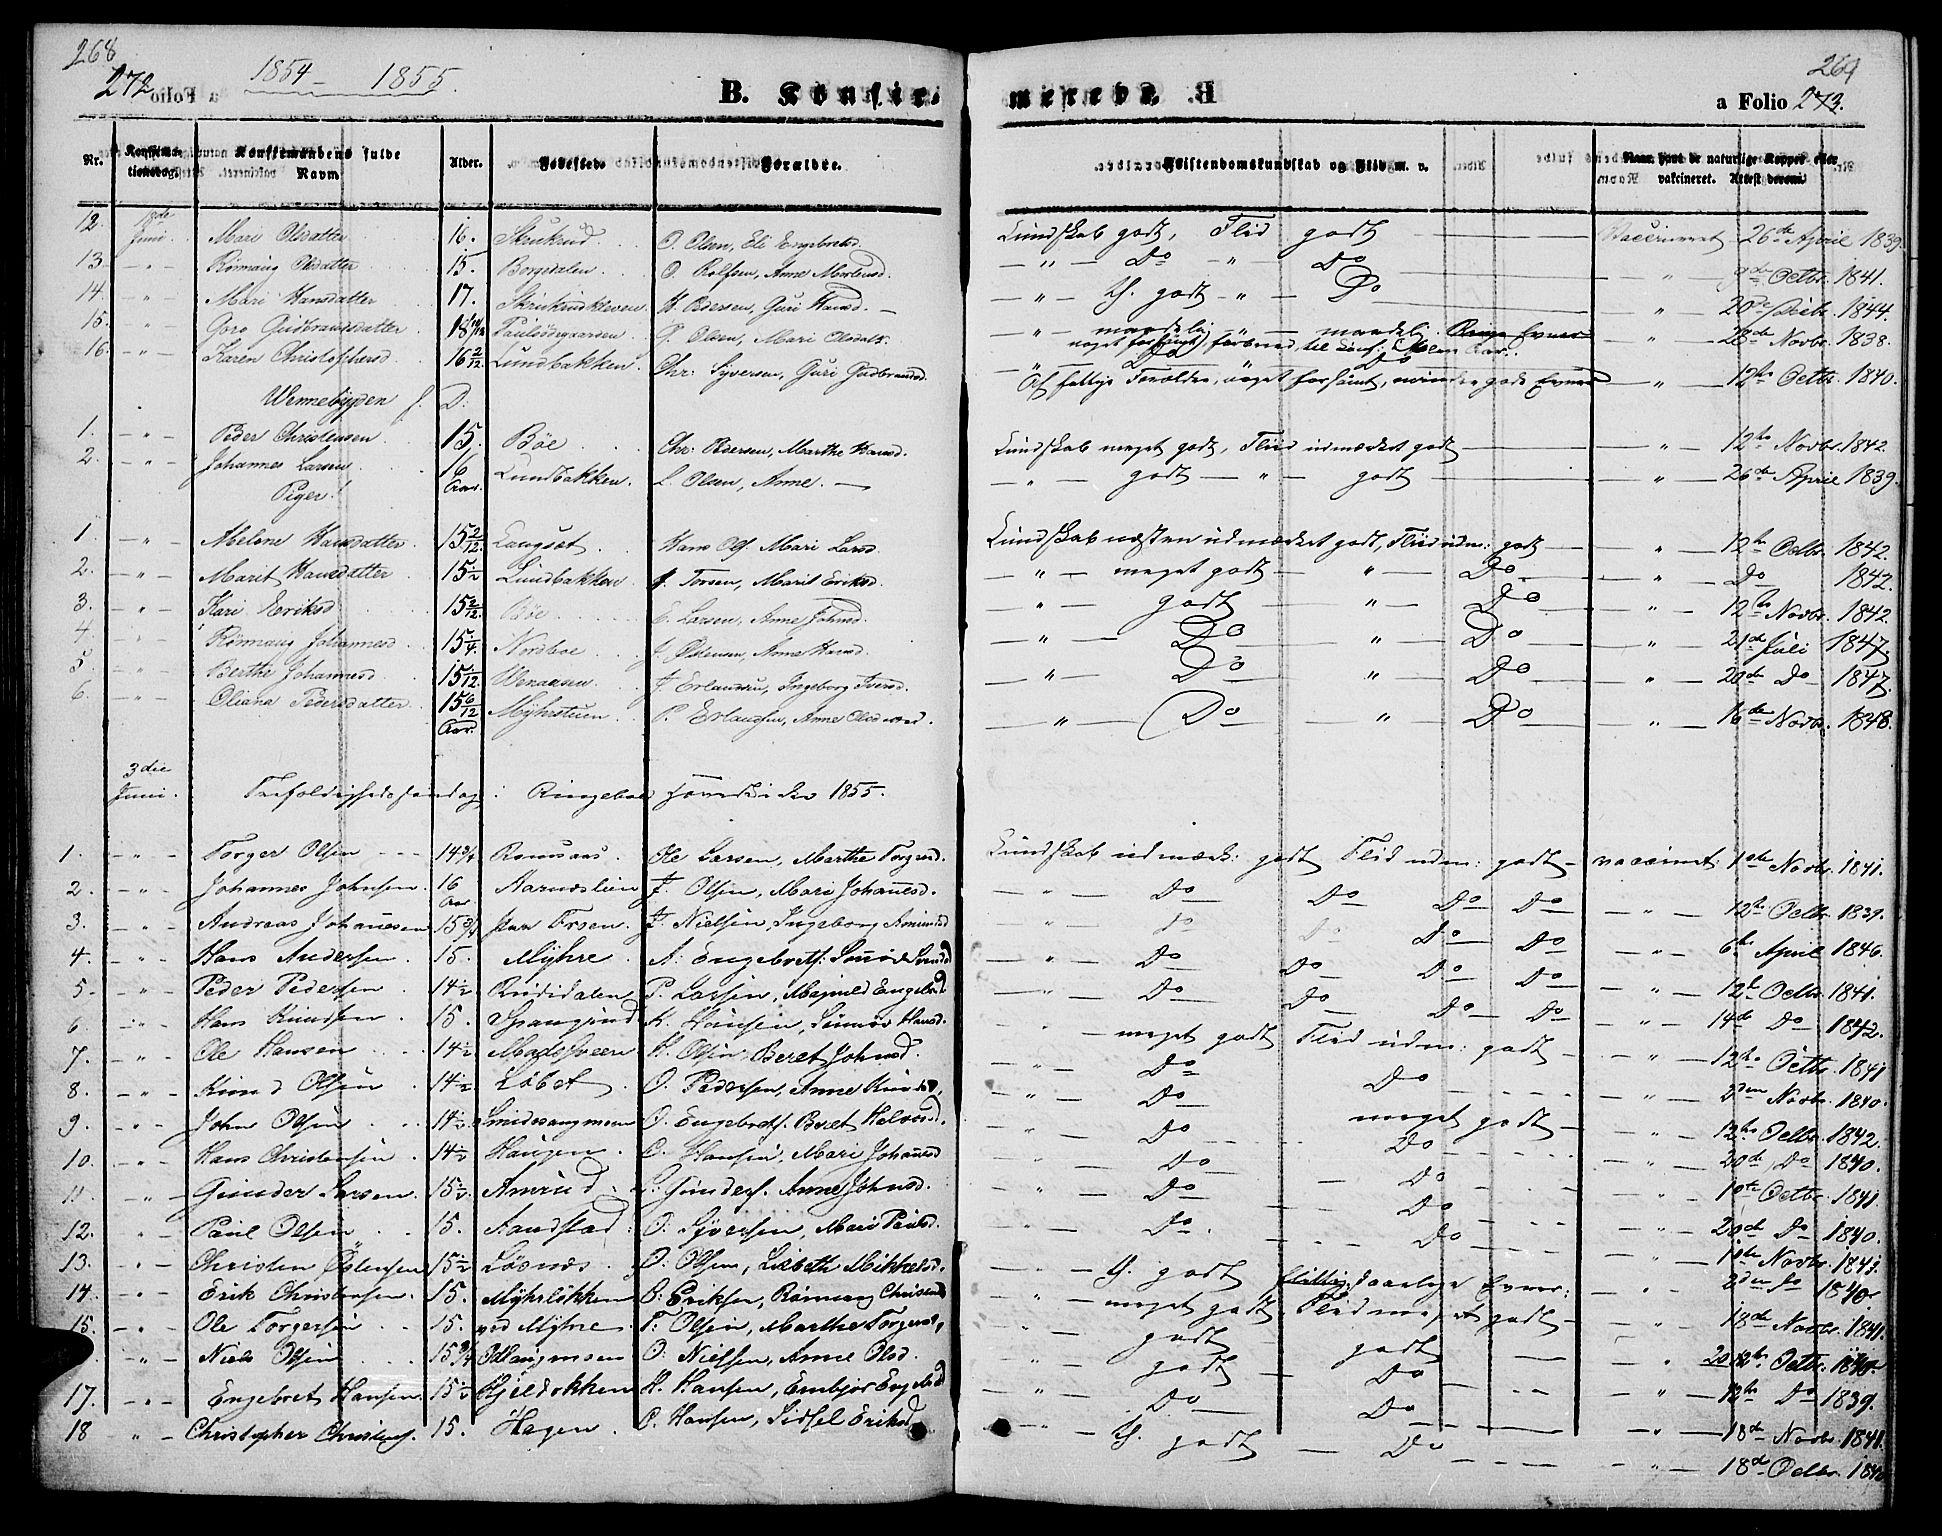 SAH, Ringebu prestekontor, Klokkerbok nr. 3, 1854-1866, s. 268-269